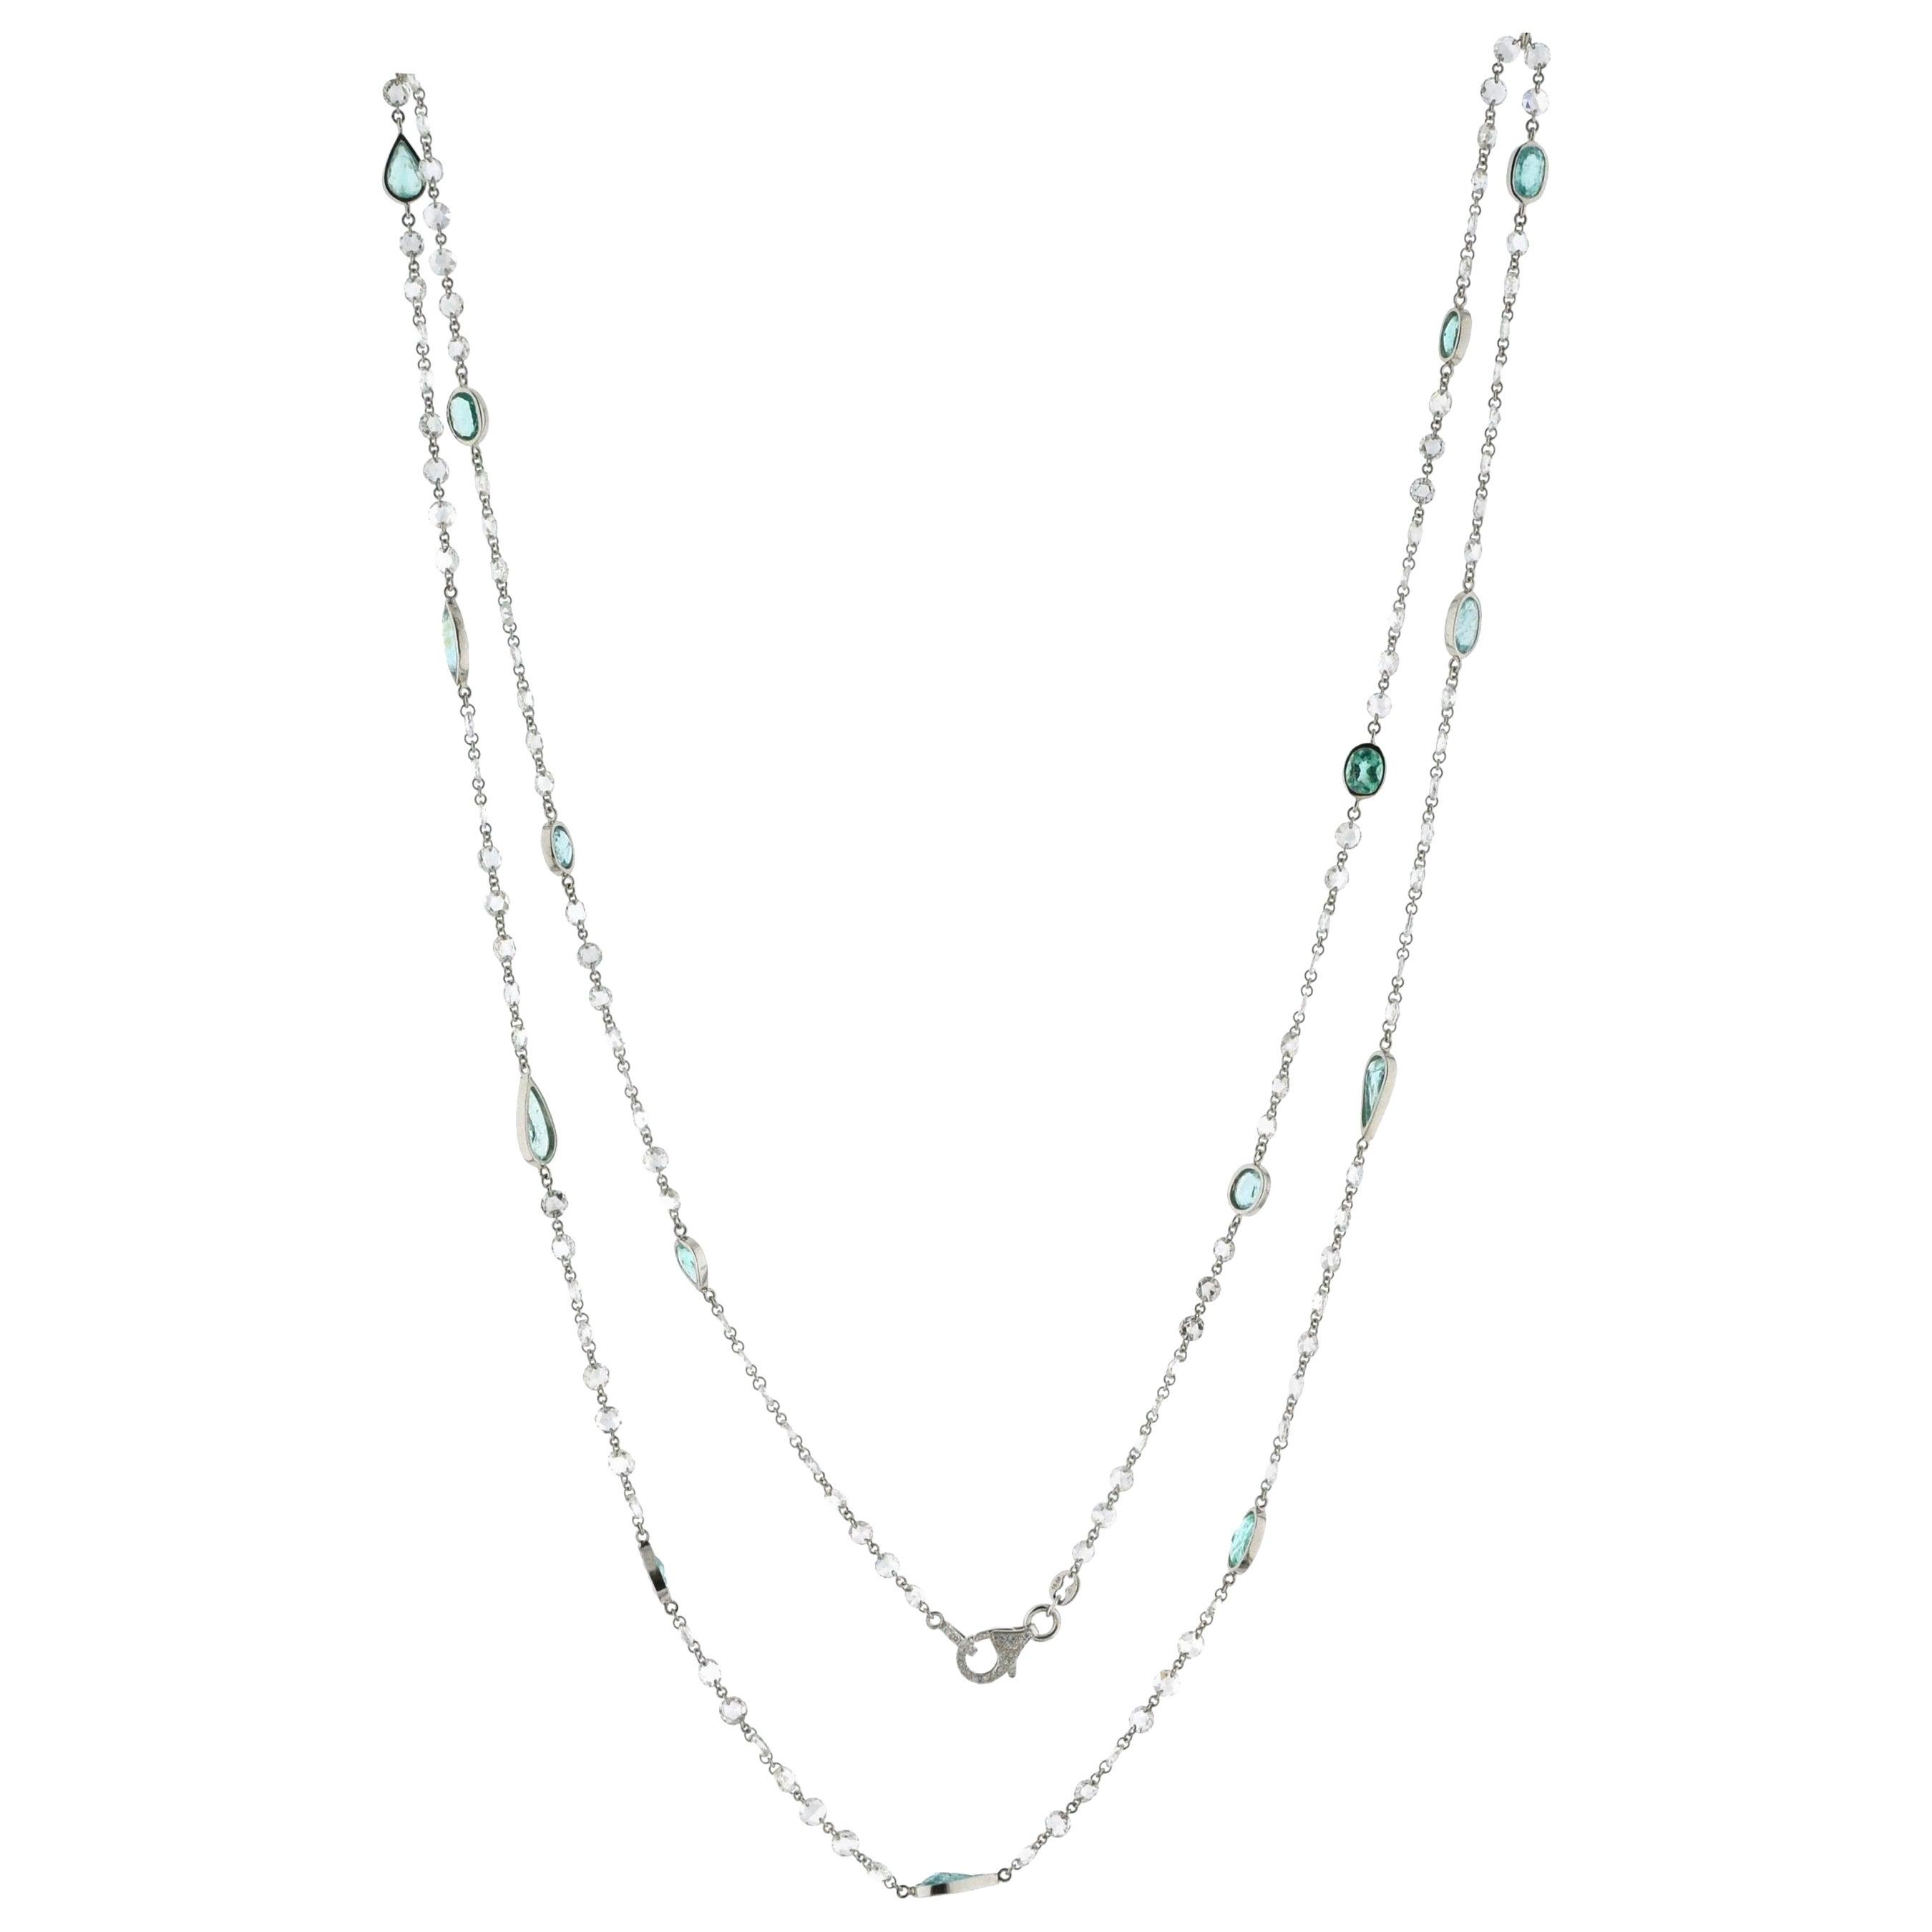 JR 18 Karat White Gold Rose Cut Diamond Paraiba Necklace